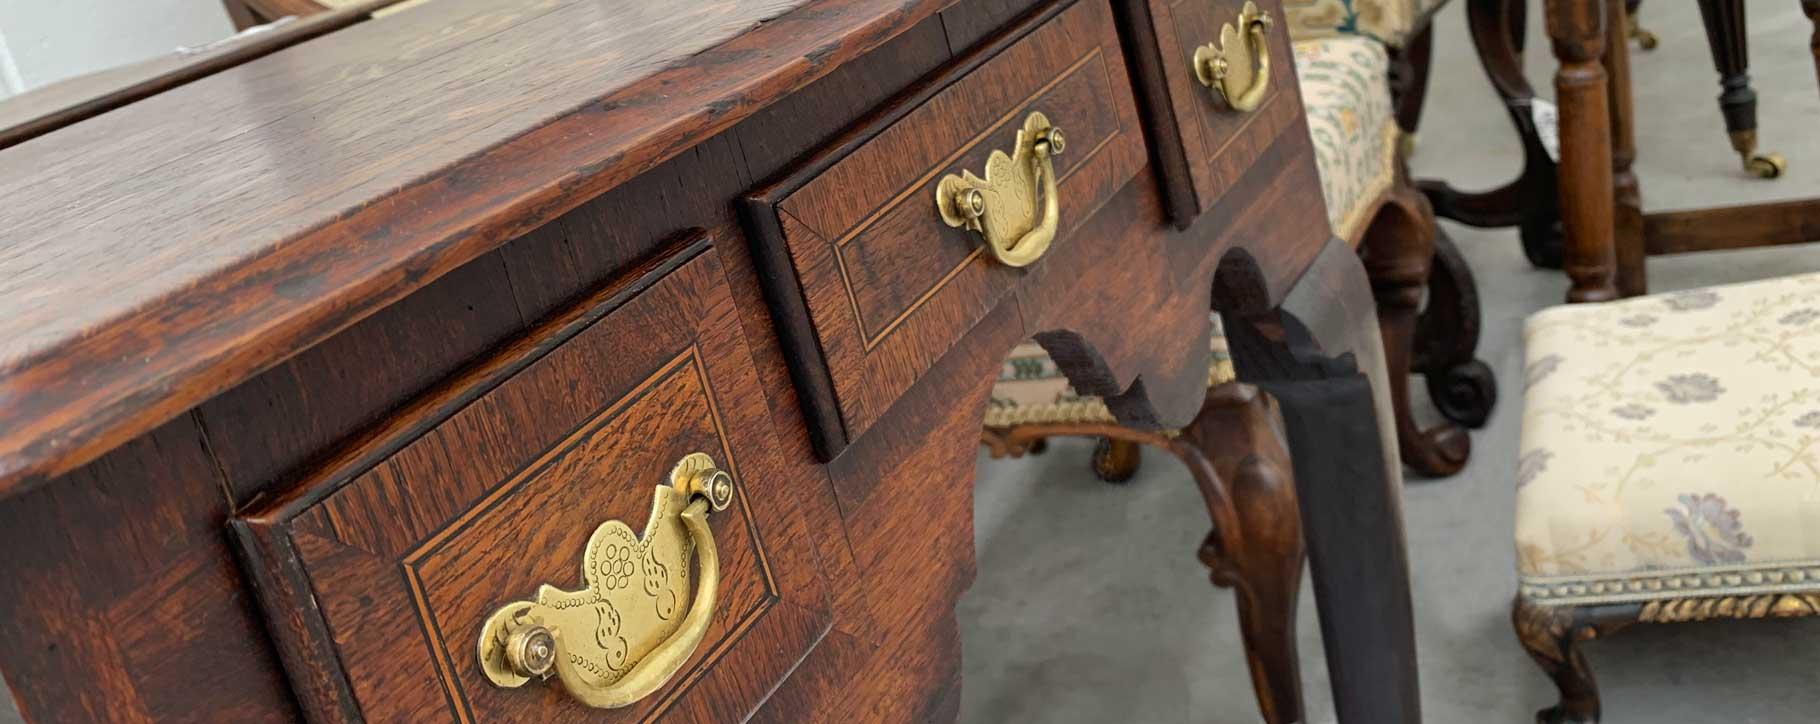 different furniture